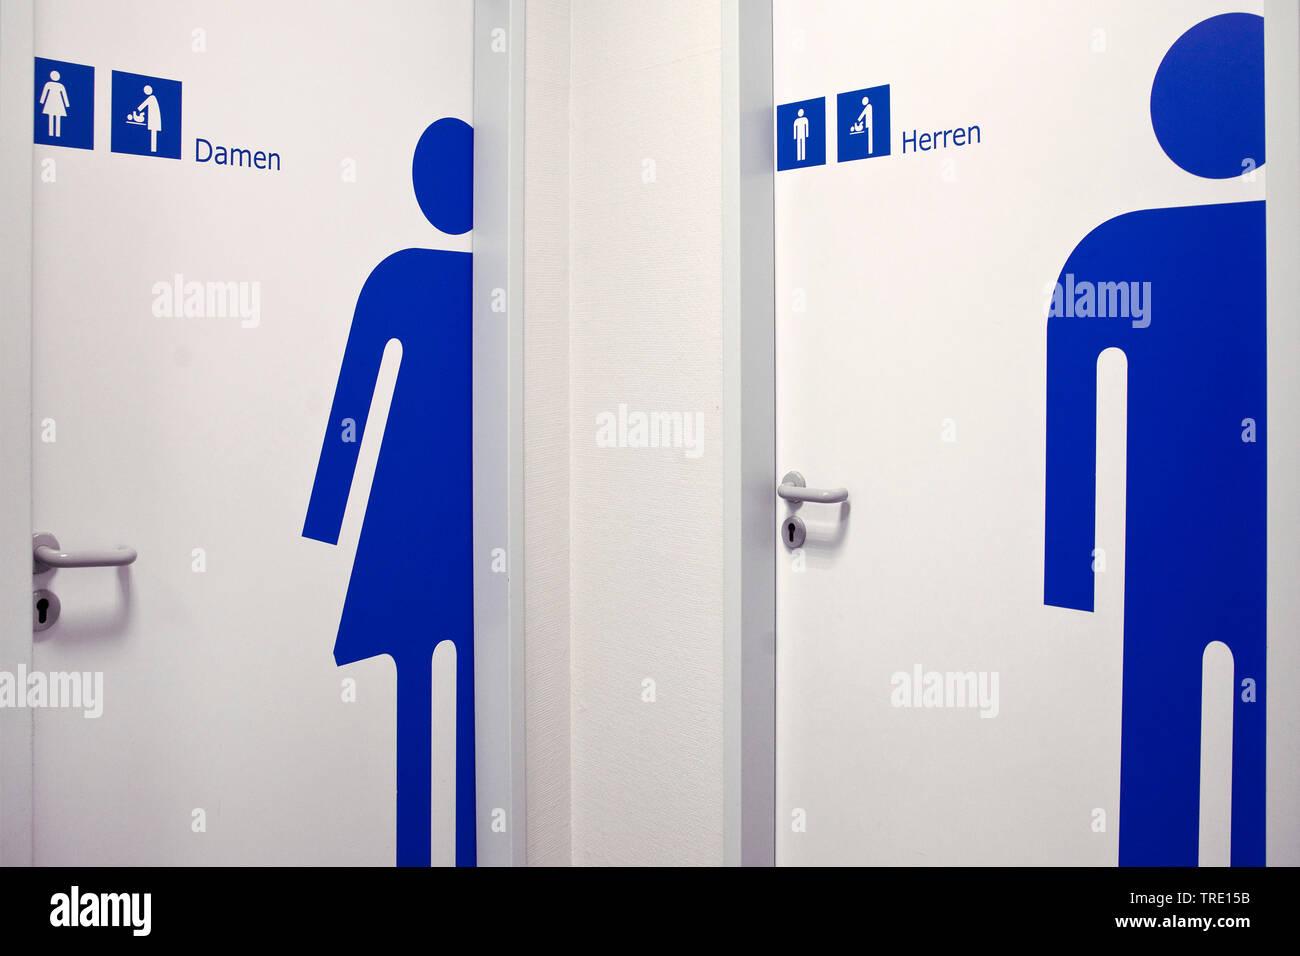 Tueren zu den Toiletten fuer Damen und Herren, Deutschland, Nordrhein-Westfalen, Ruhrgebiet, Essen   toilet doors for ladies and men, Germany, North R - Stock Image